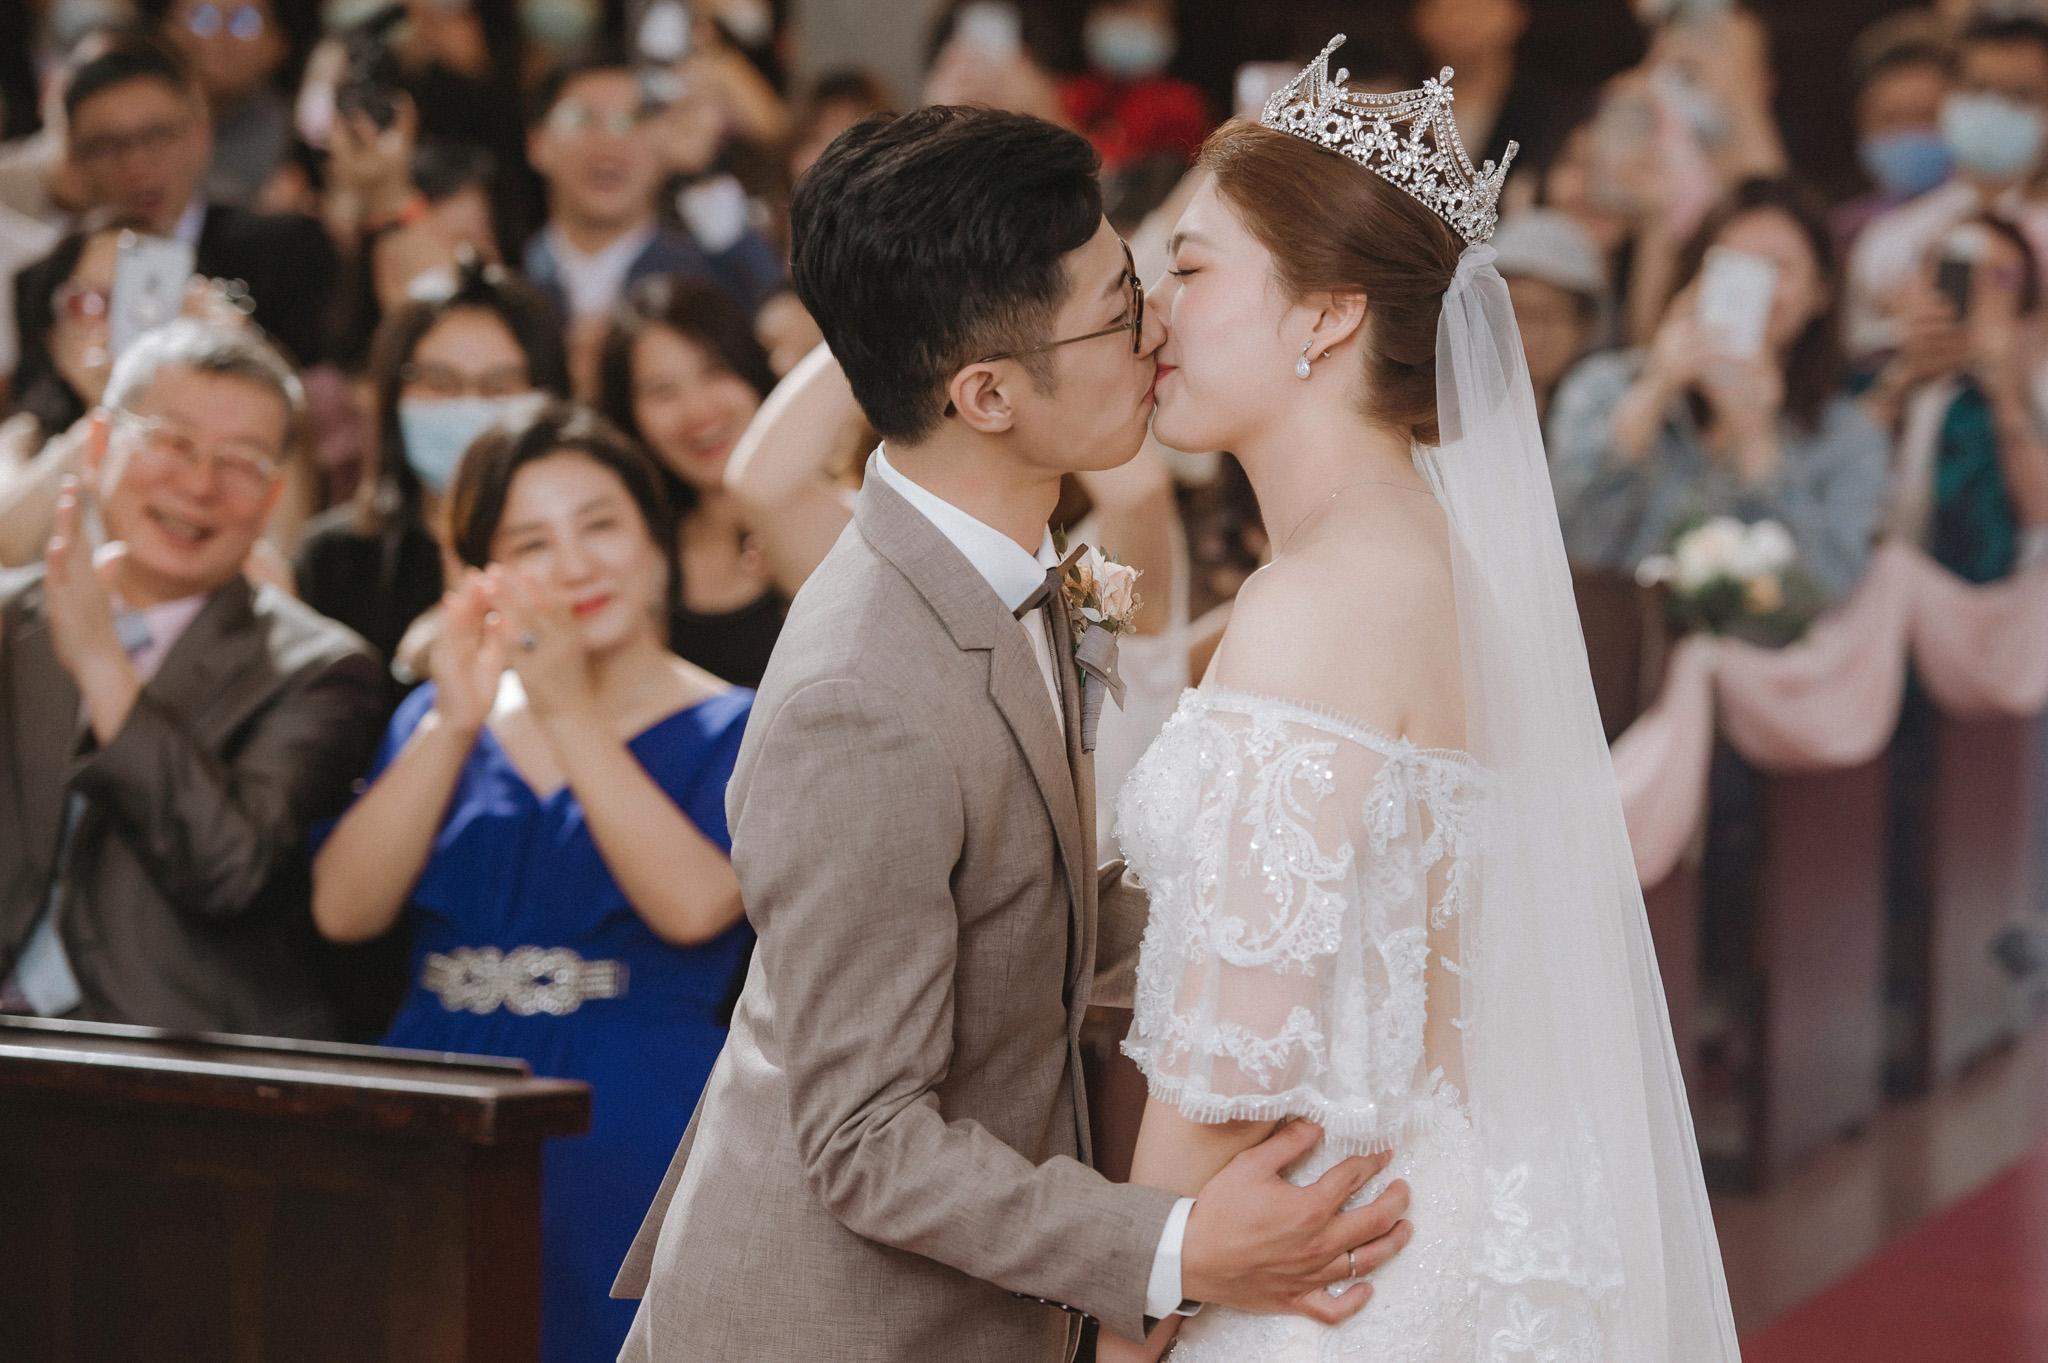 EW 台北婚攝 居米 濟南教會 Brick Yard 33 美軍俱樂部 婚禮 婚宴-34